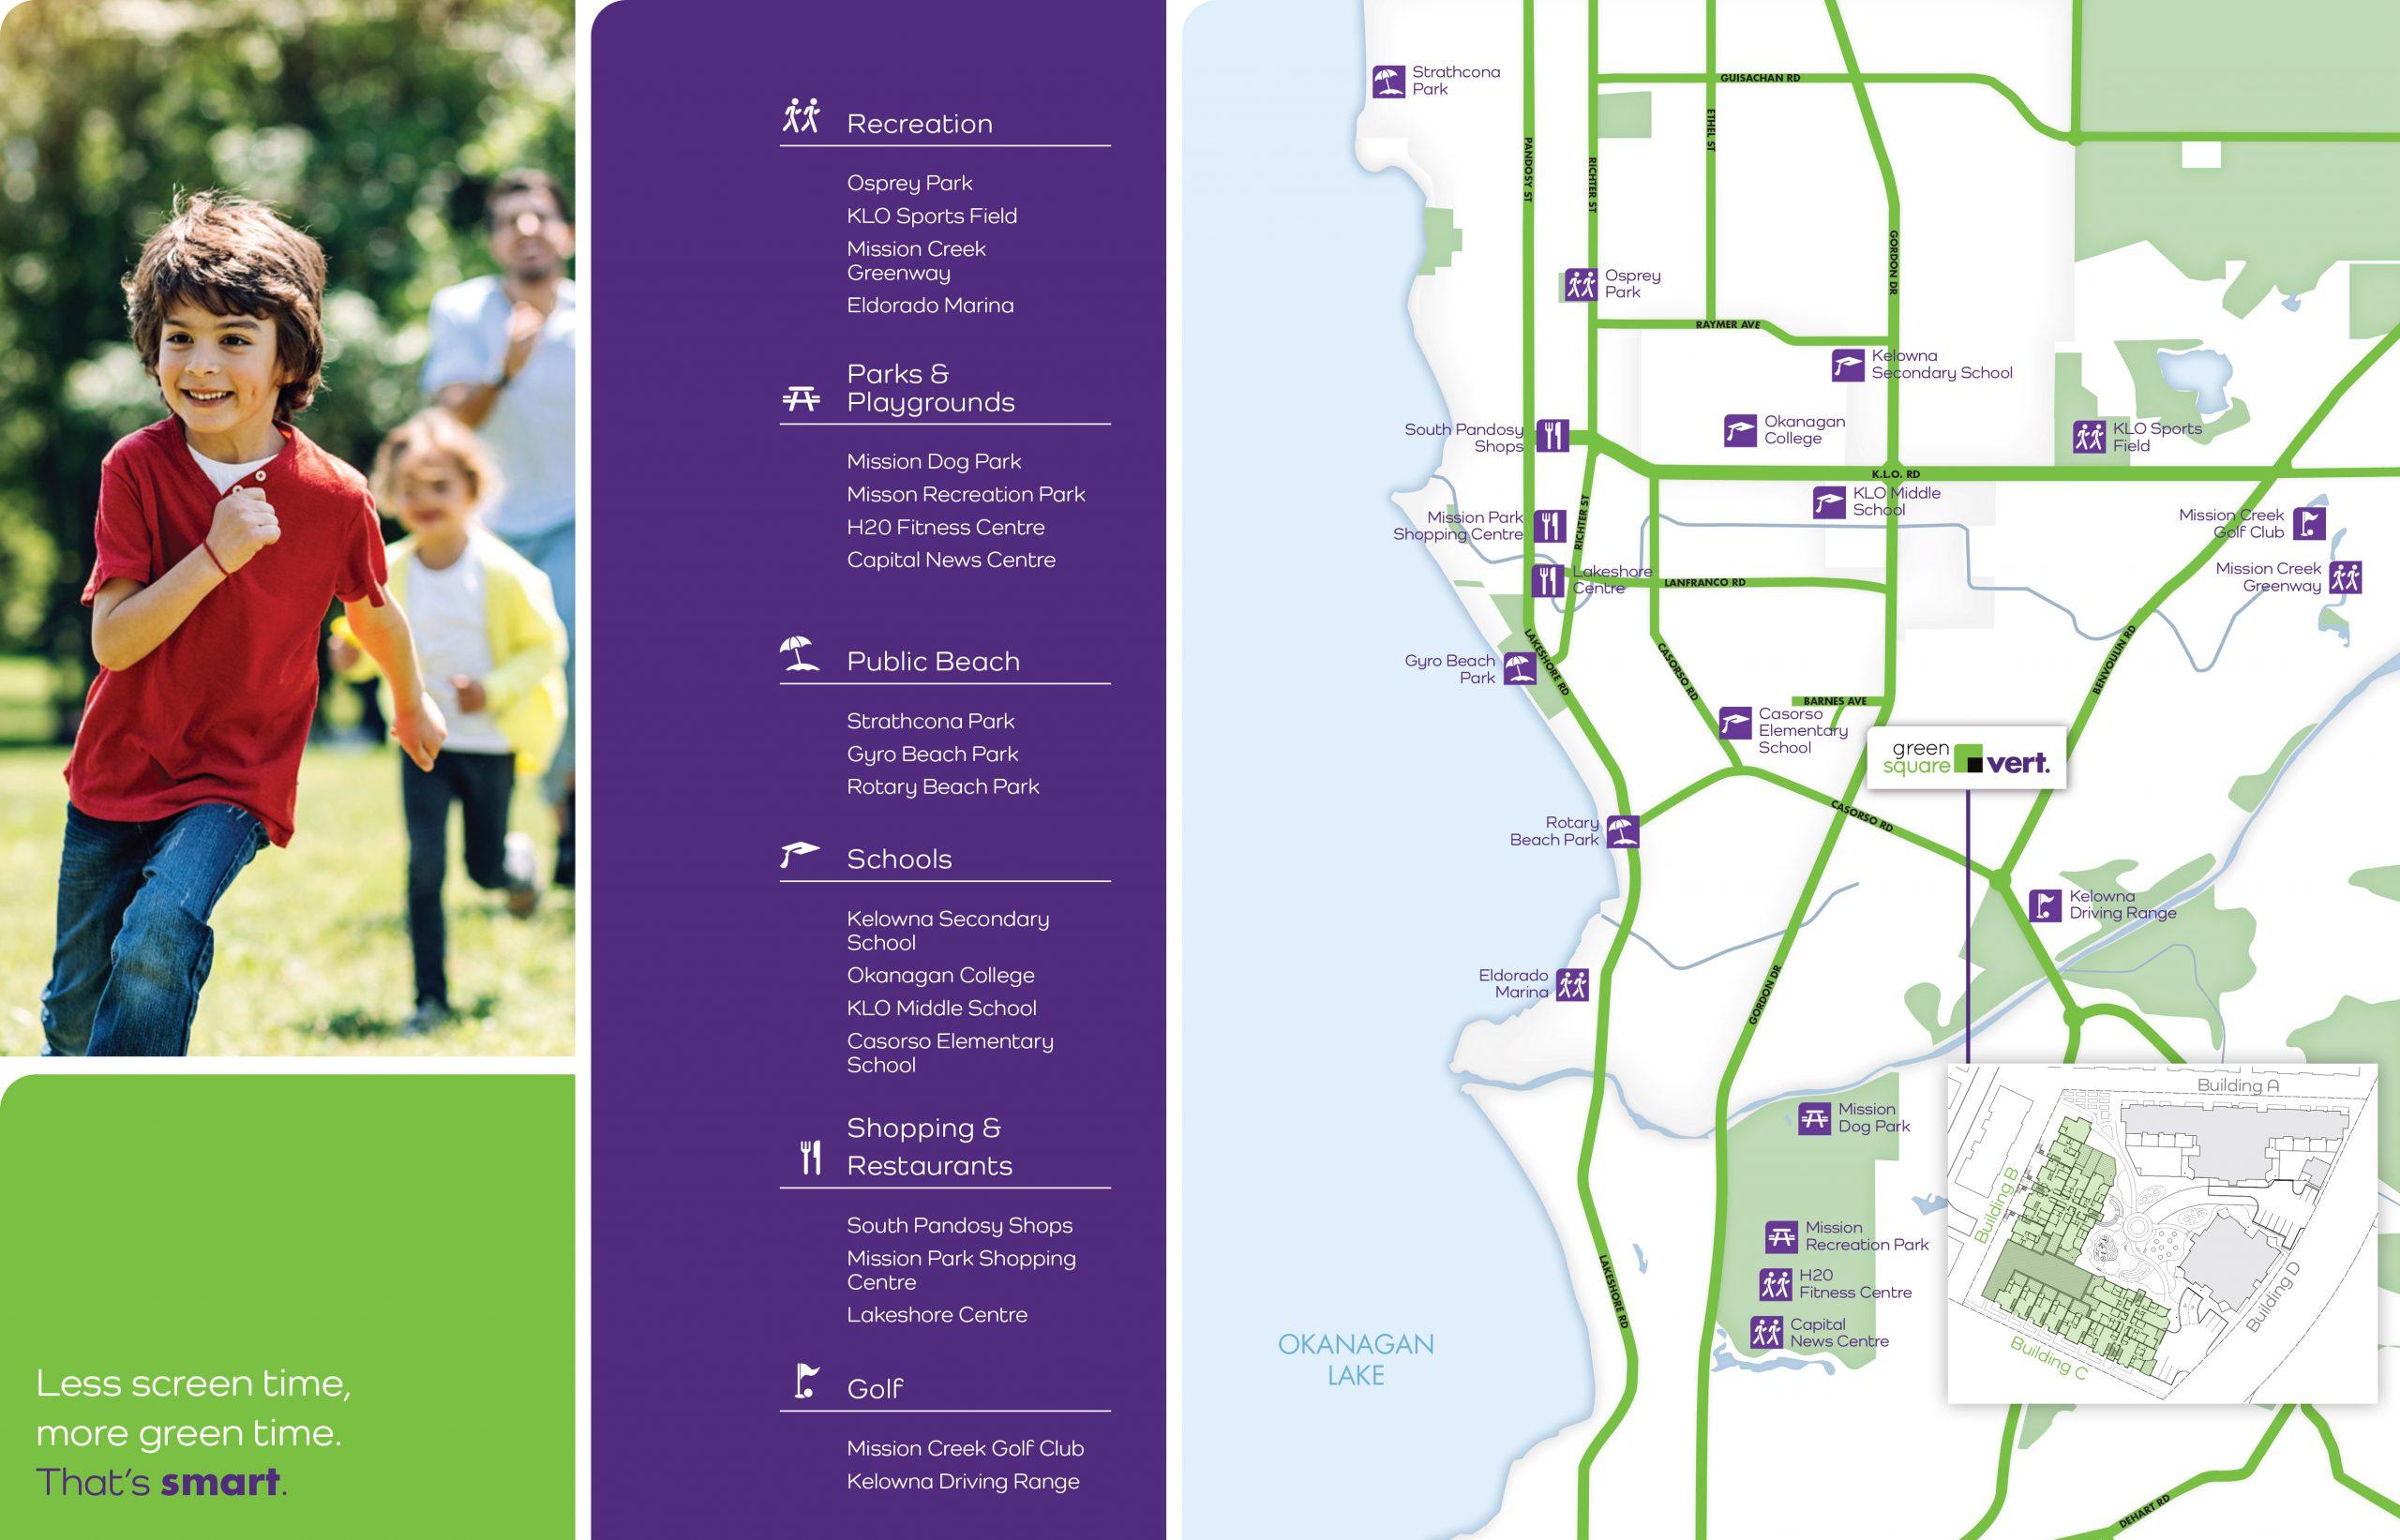 Green Square Vert Community Map